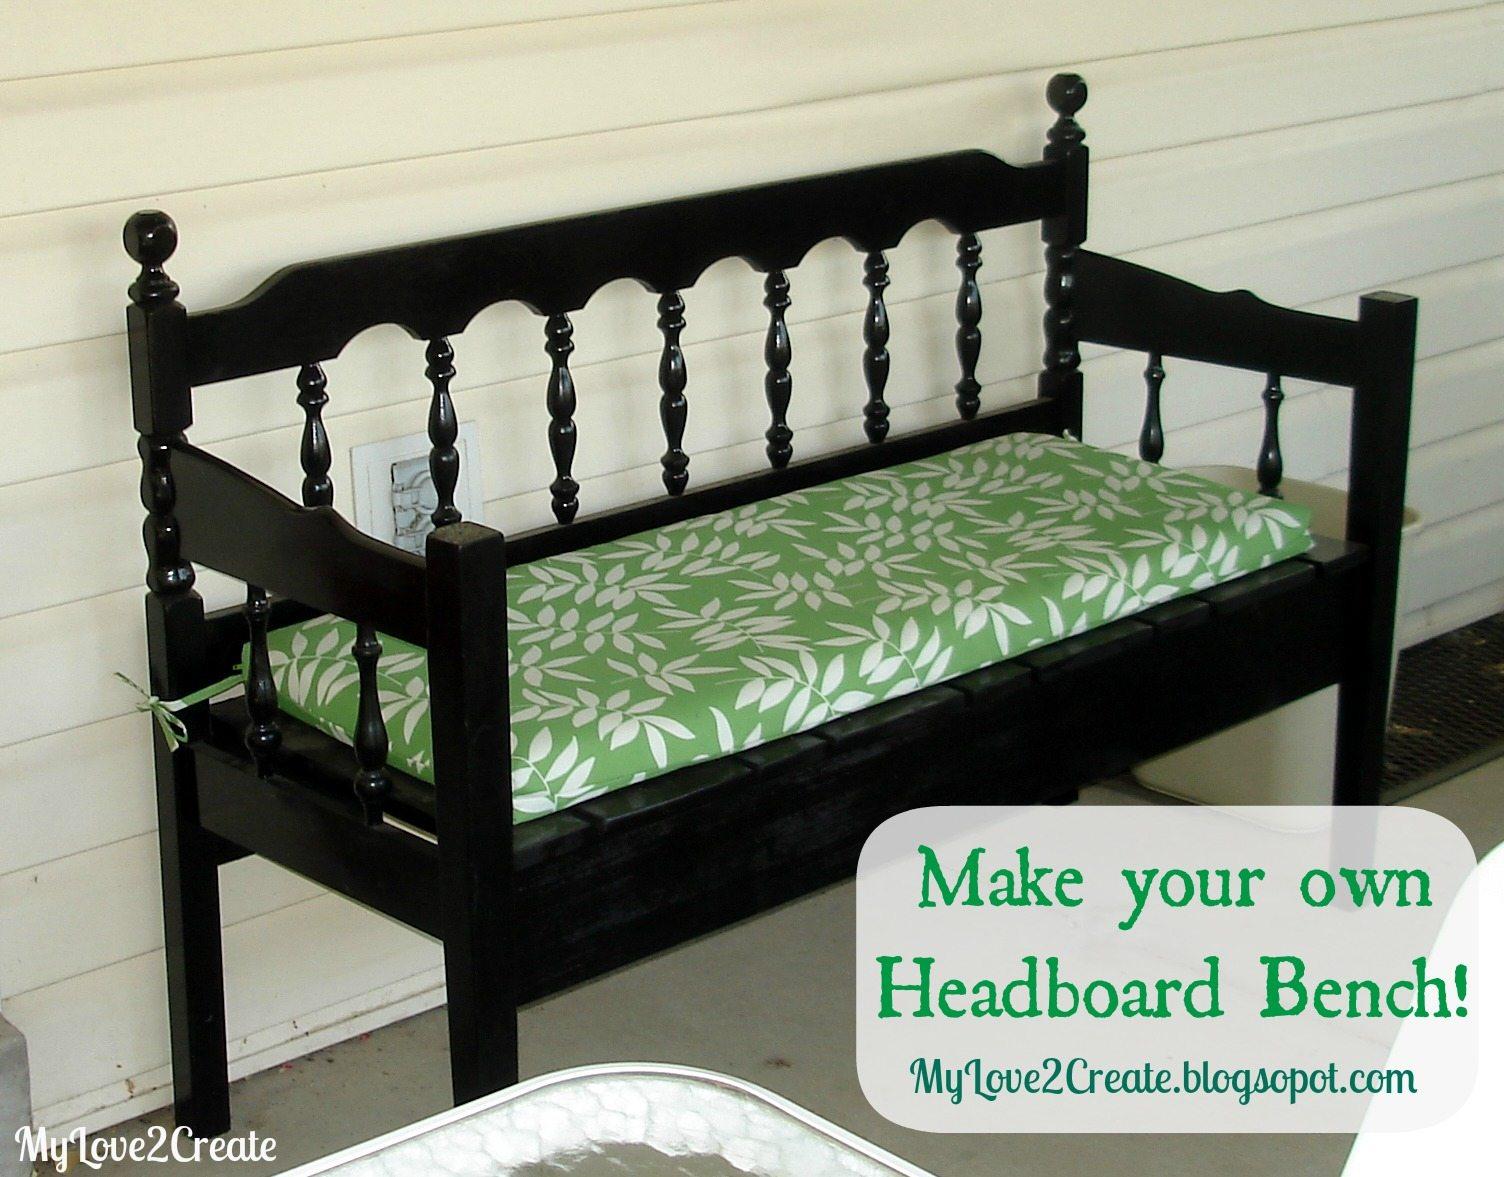 50 headboard bench ideas my